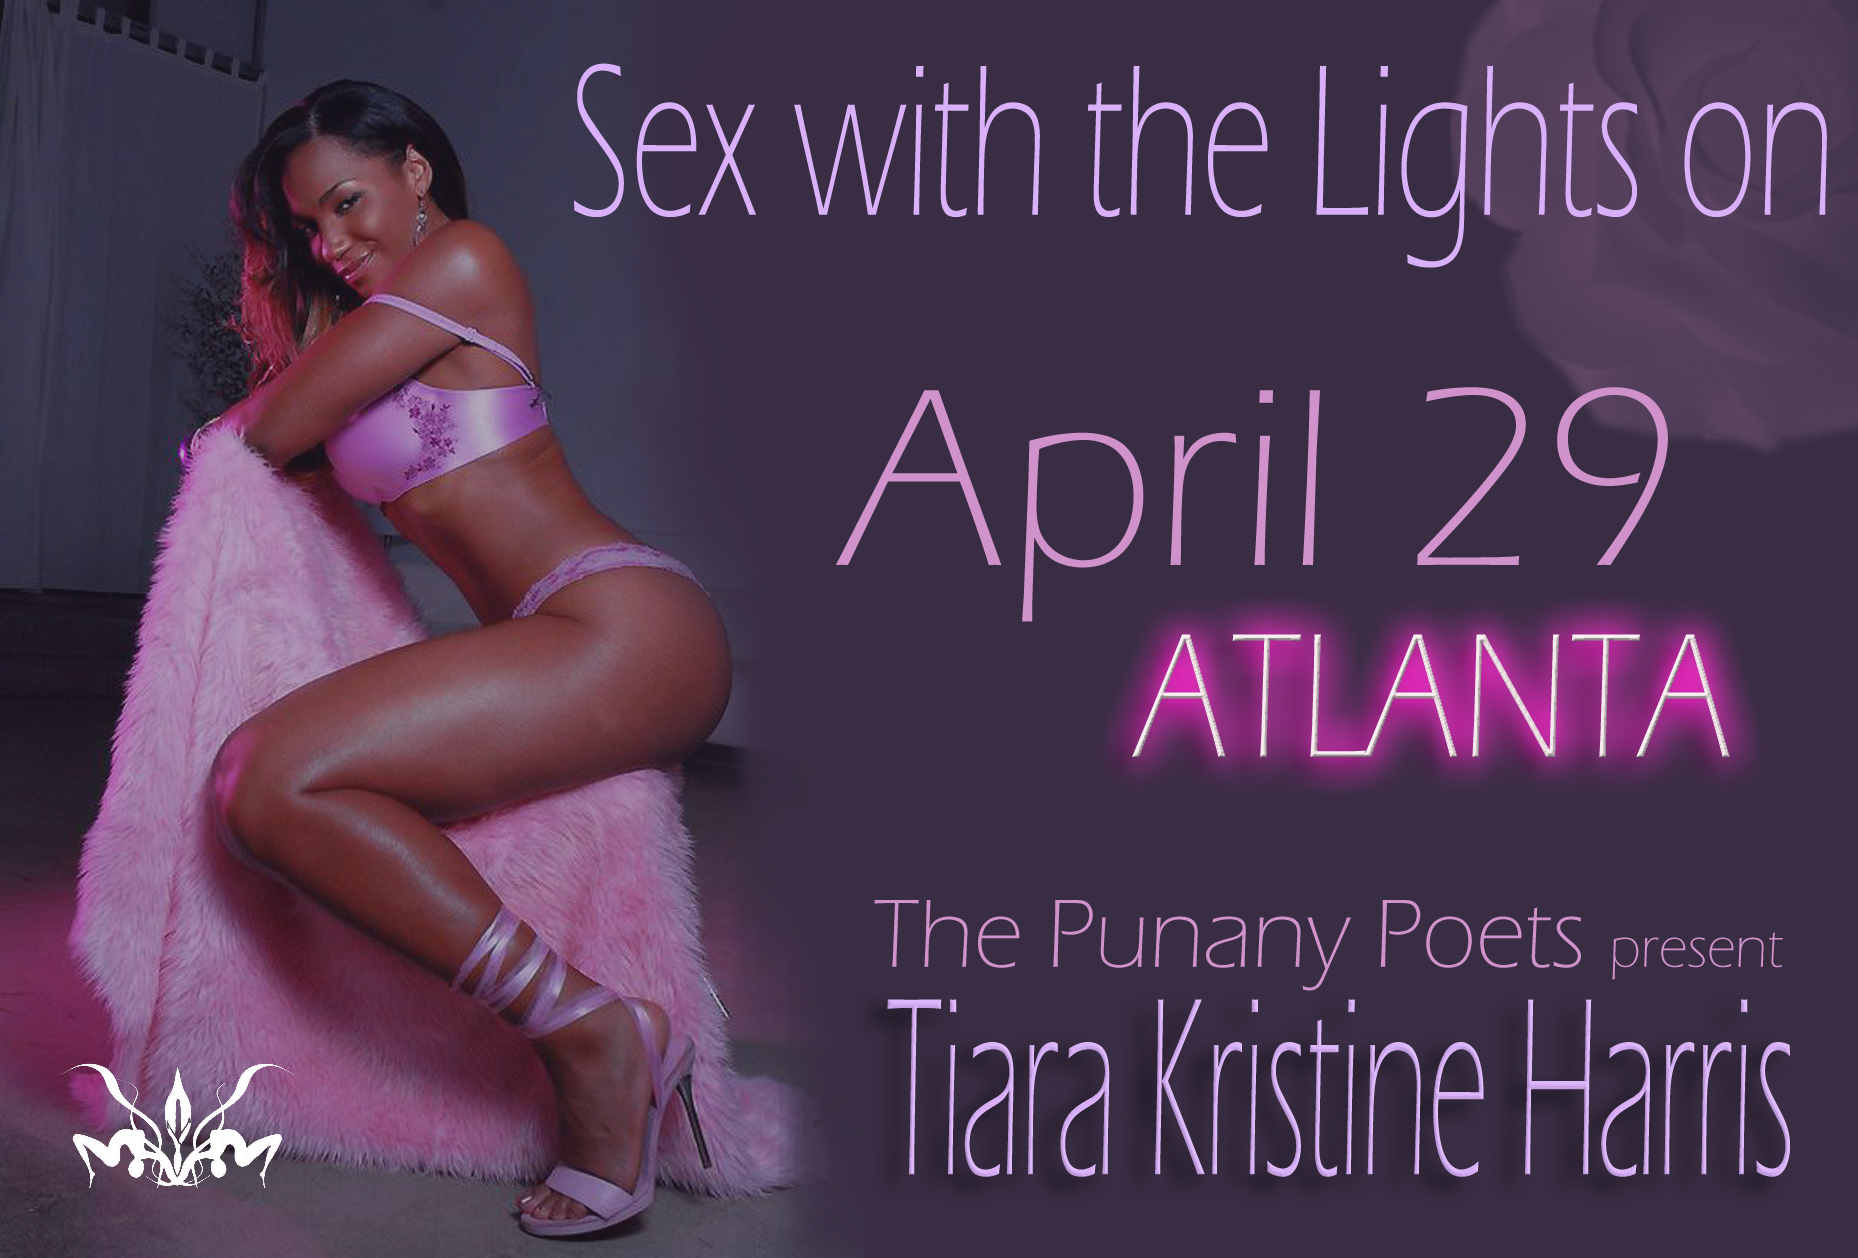 The Punany Poets Tiara Kristine